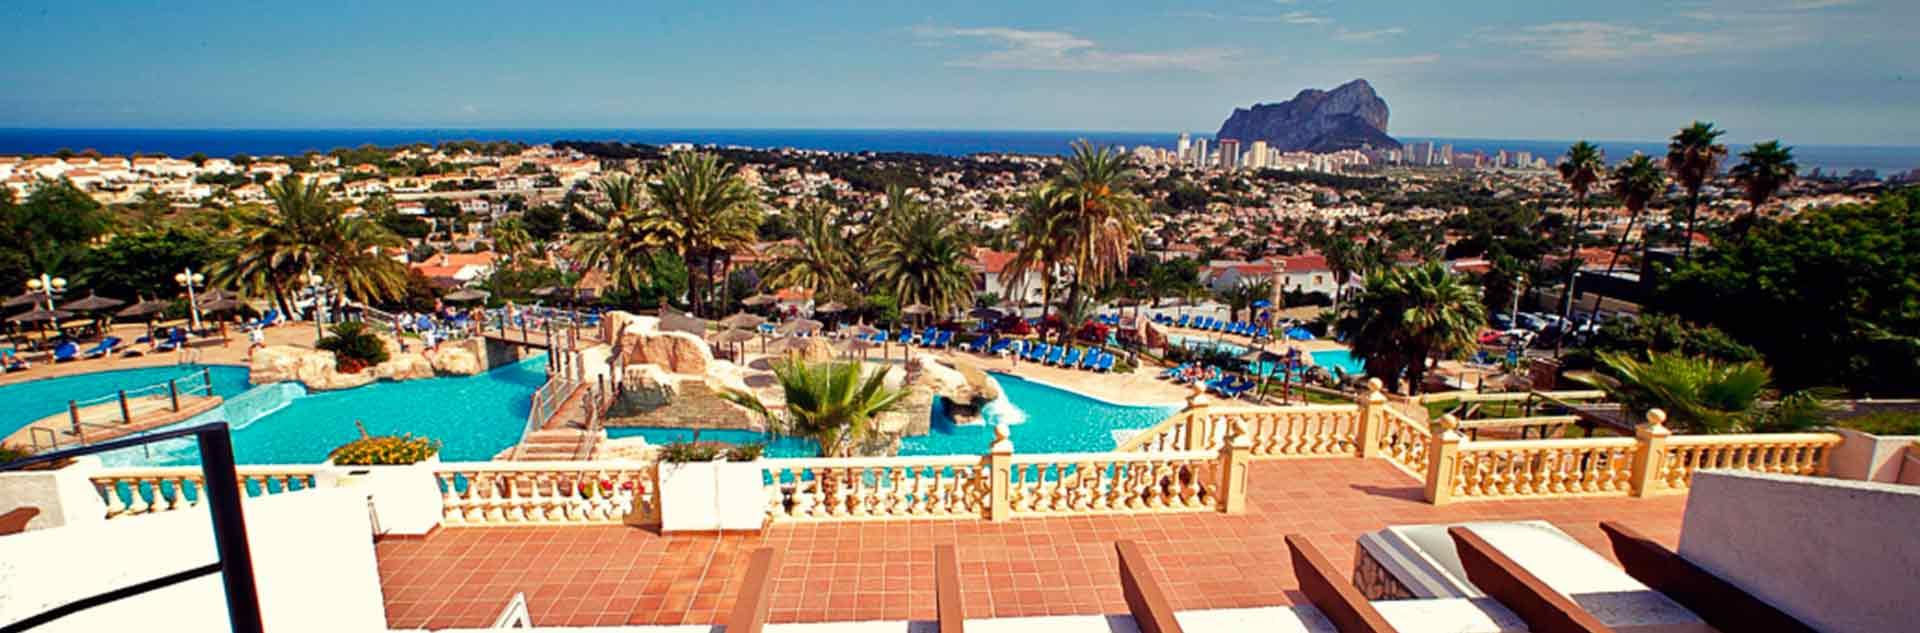 Vistas exteriores del hotel AR Impertial Park Spa Resort de Calpe